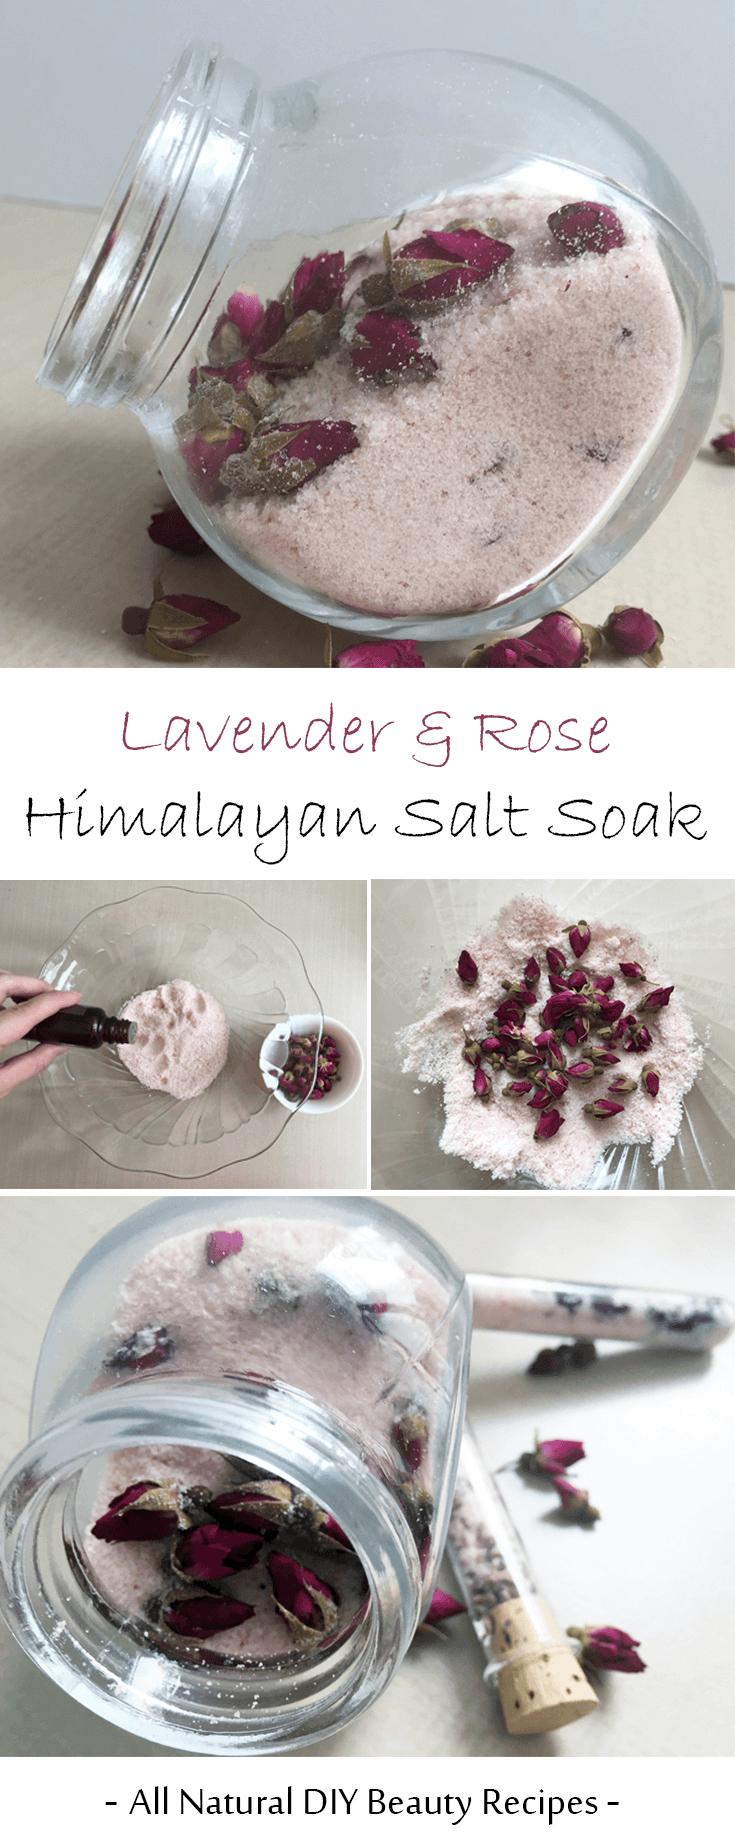 Homemade DIY Lavender And Rose Himalayan Salt Soak - Pamper yourself ...